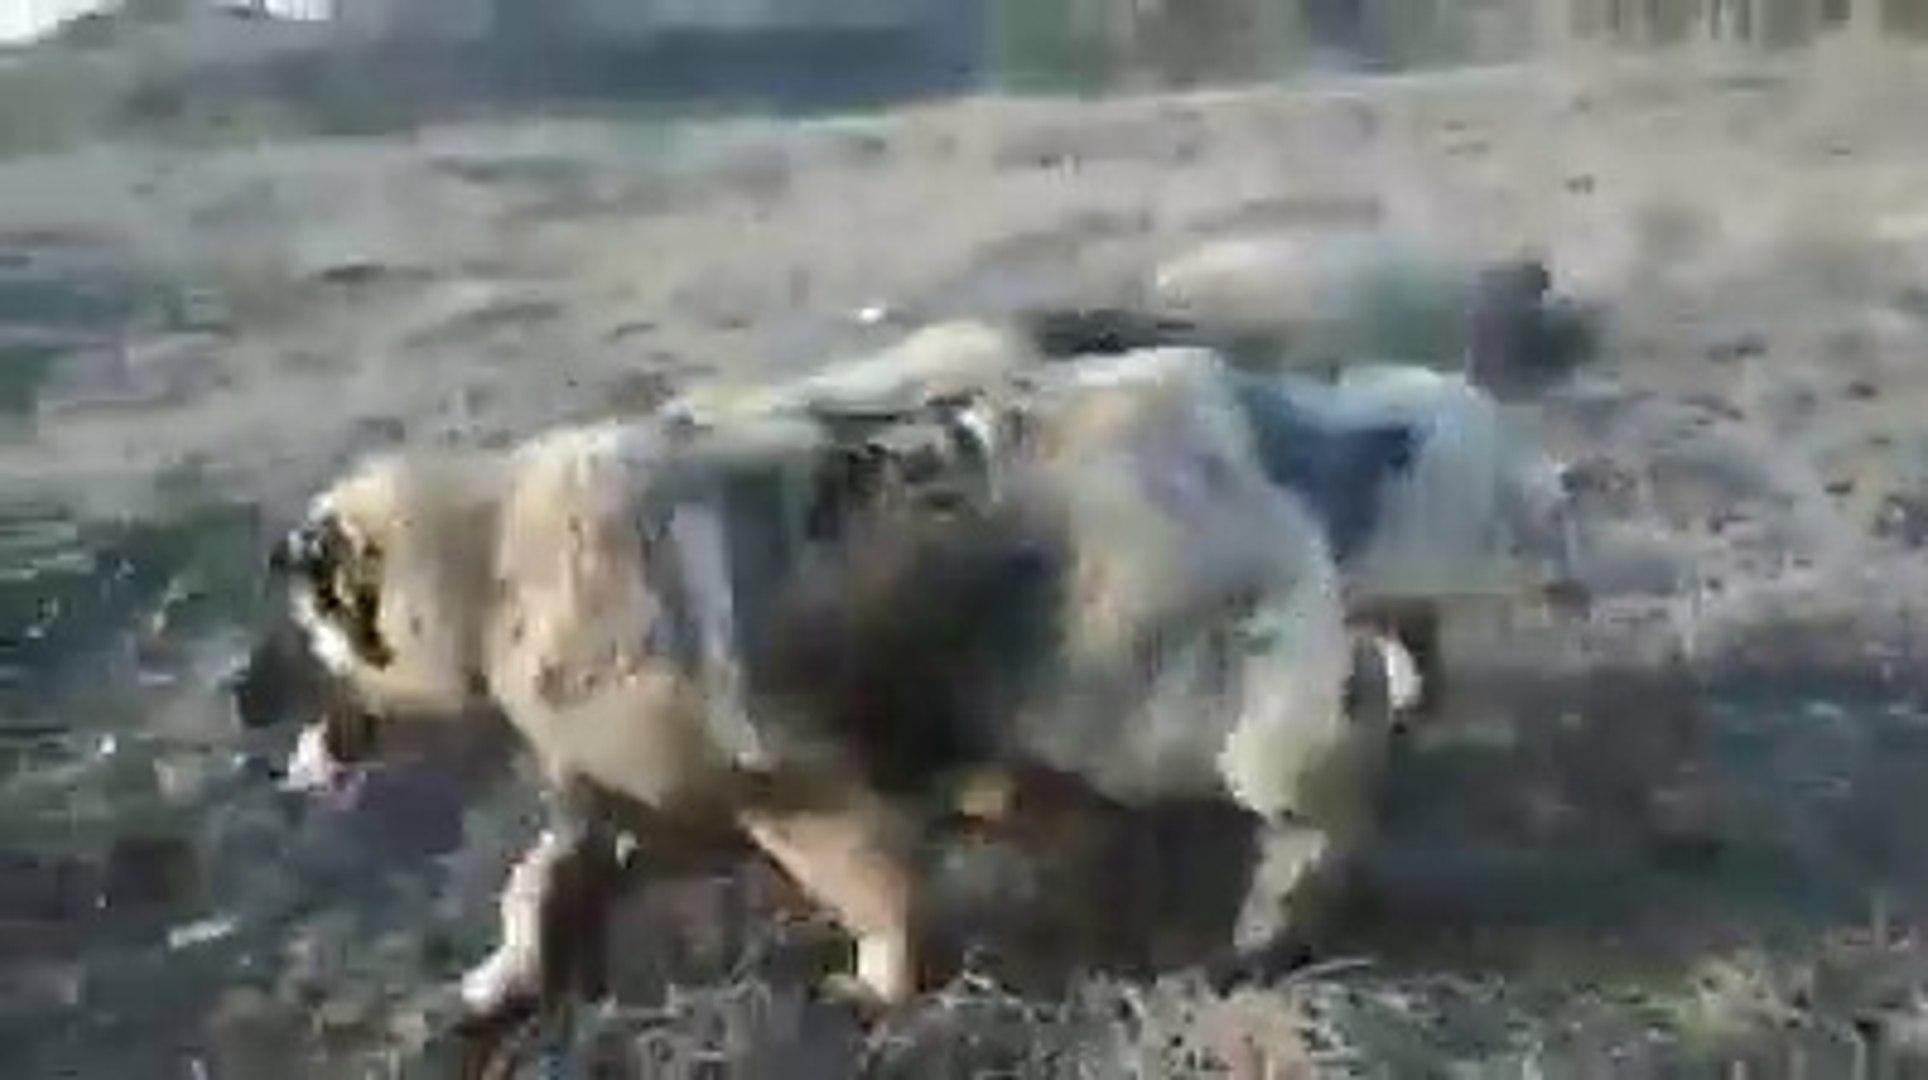 KAFKAS COBAN KOPEKLERiNDEN OGLEN SPORU - CAUCASiAN SHEPHERD DOGS EXERCiSE